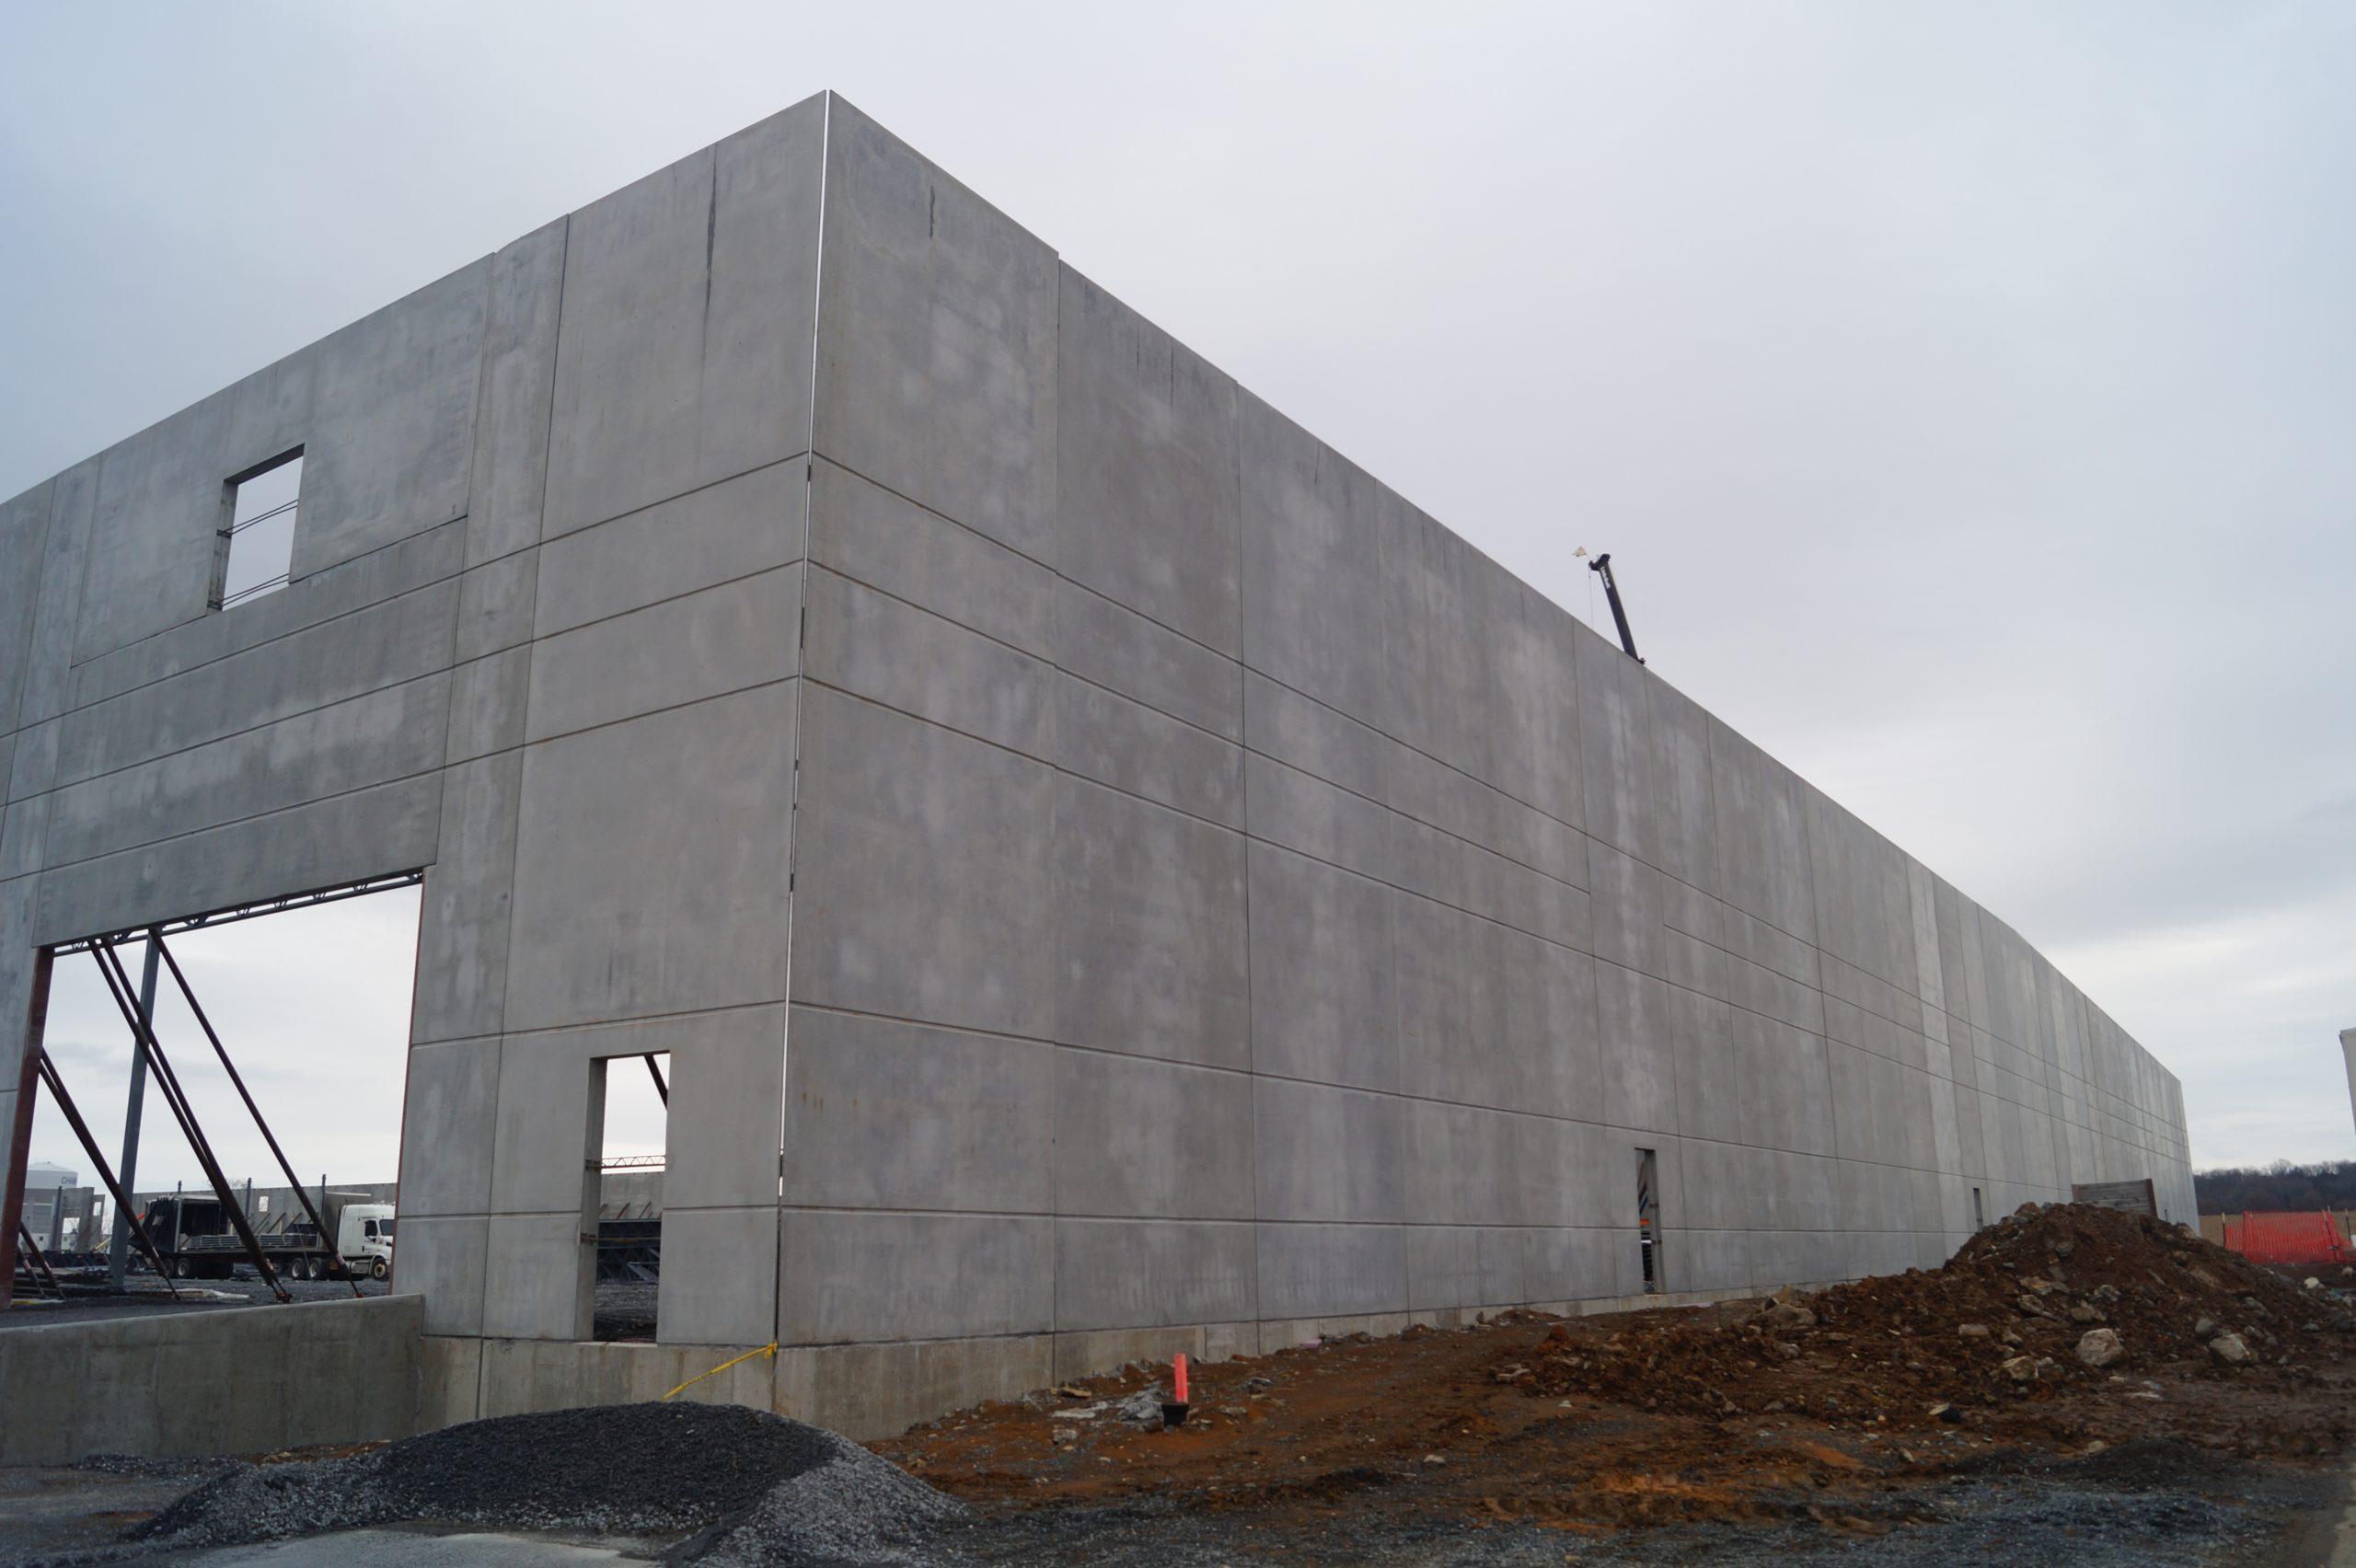 Warehouse construction using precast concrete